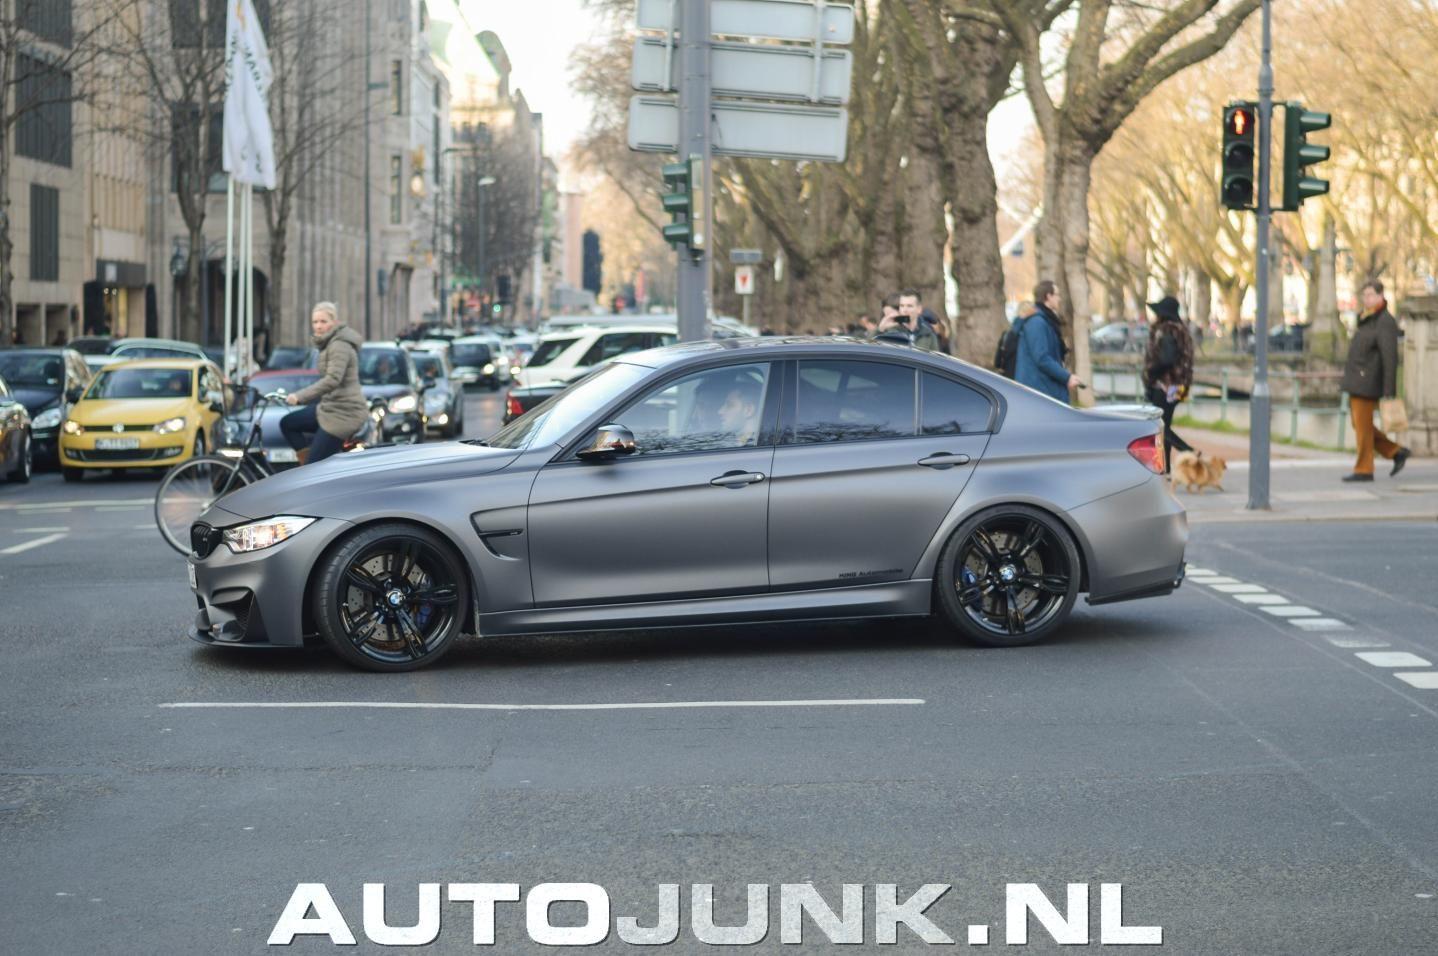 http://www.autojunk.nl/2016/03/bmw-m3-f80-12